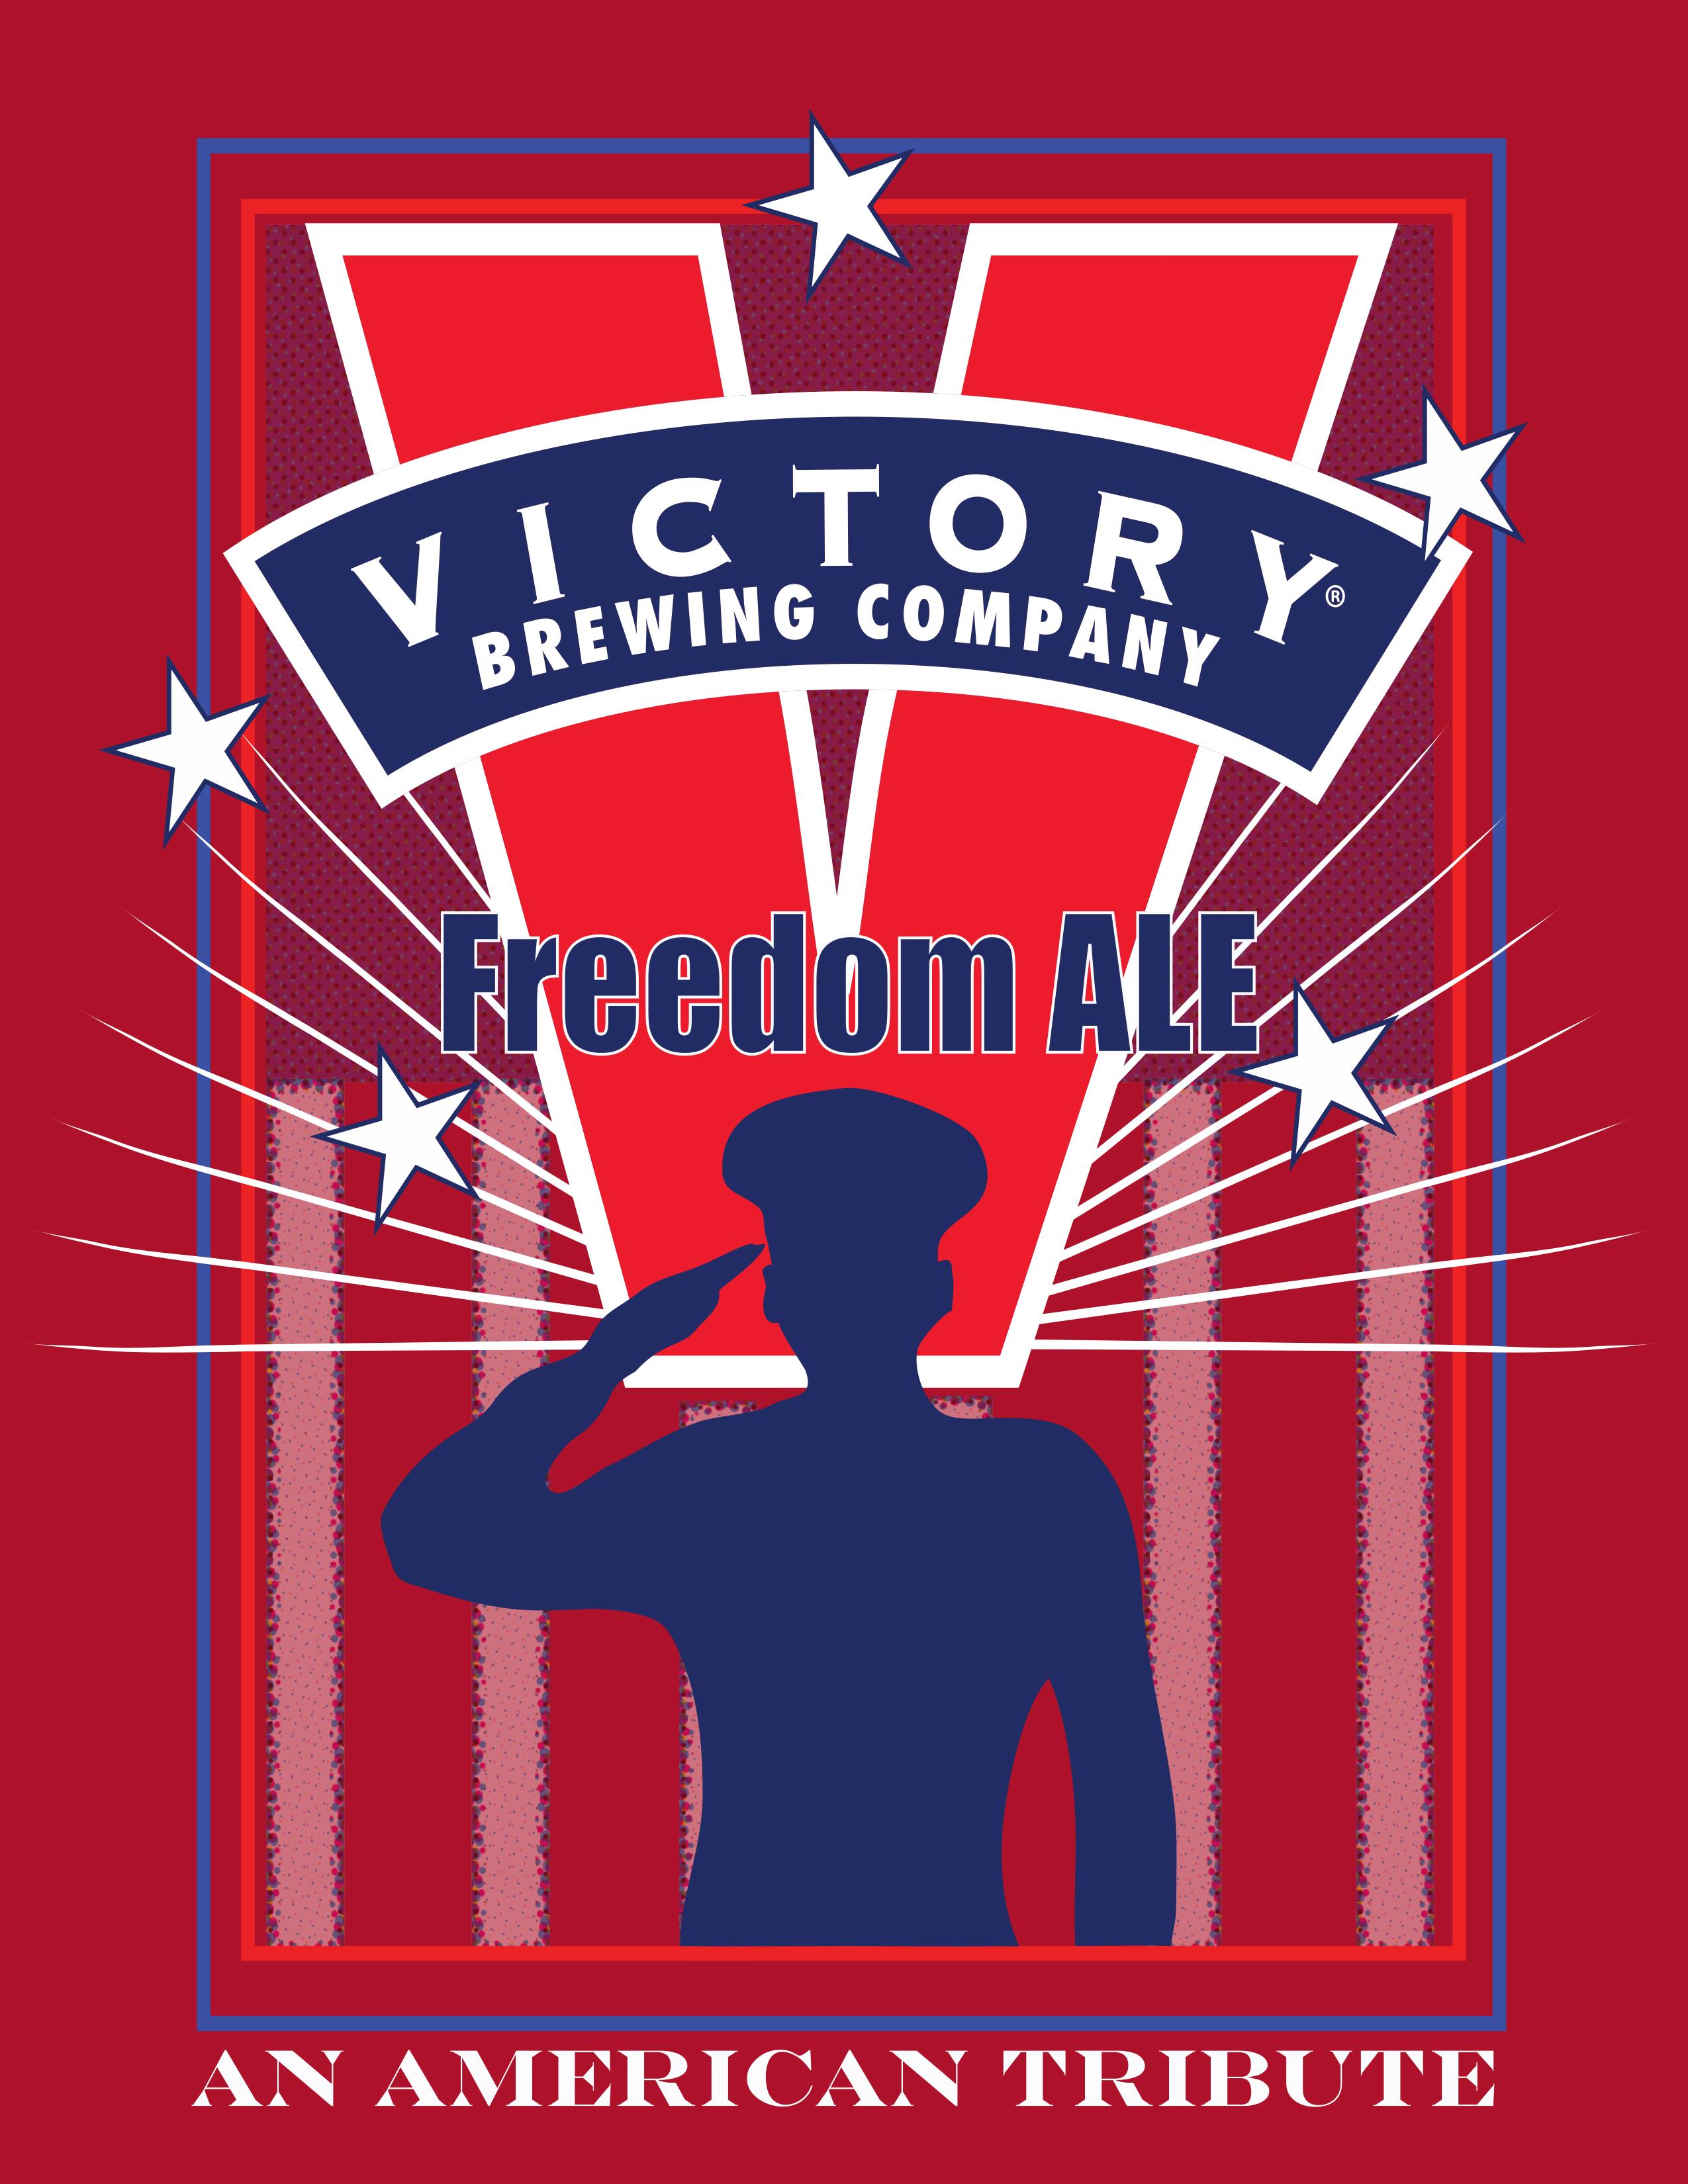 Victory Label